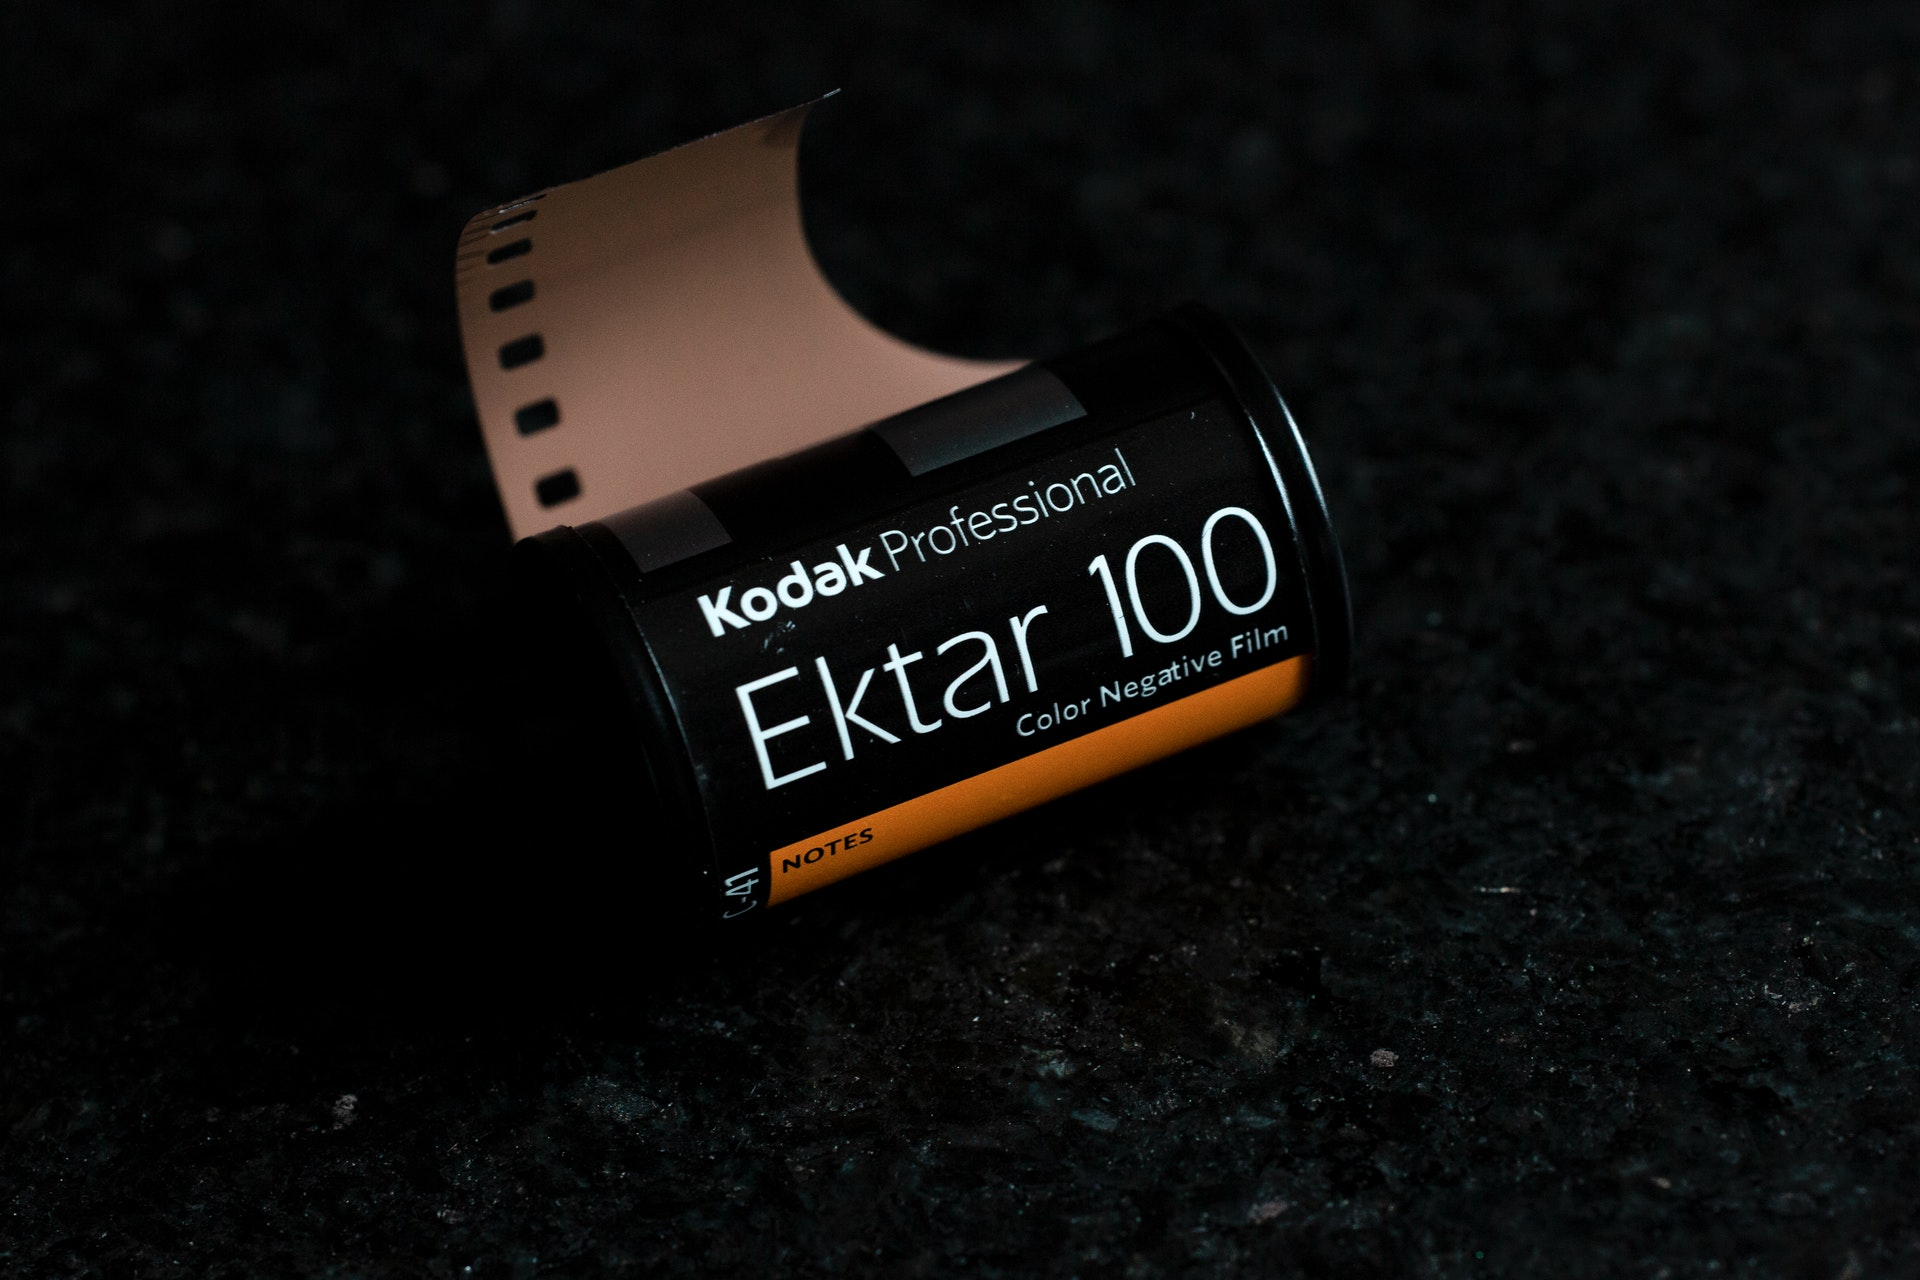 Kodak Ektar 100 (Pic: Markus Spiske/Pexels)